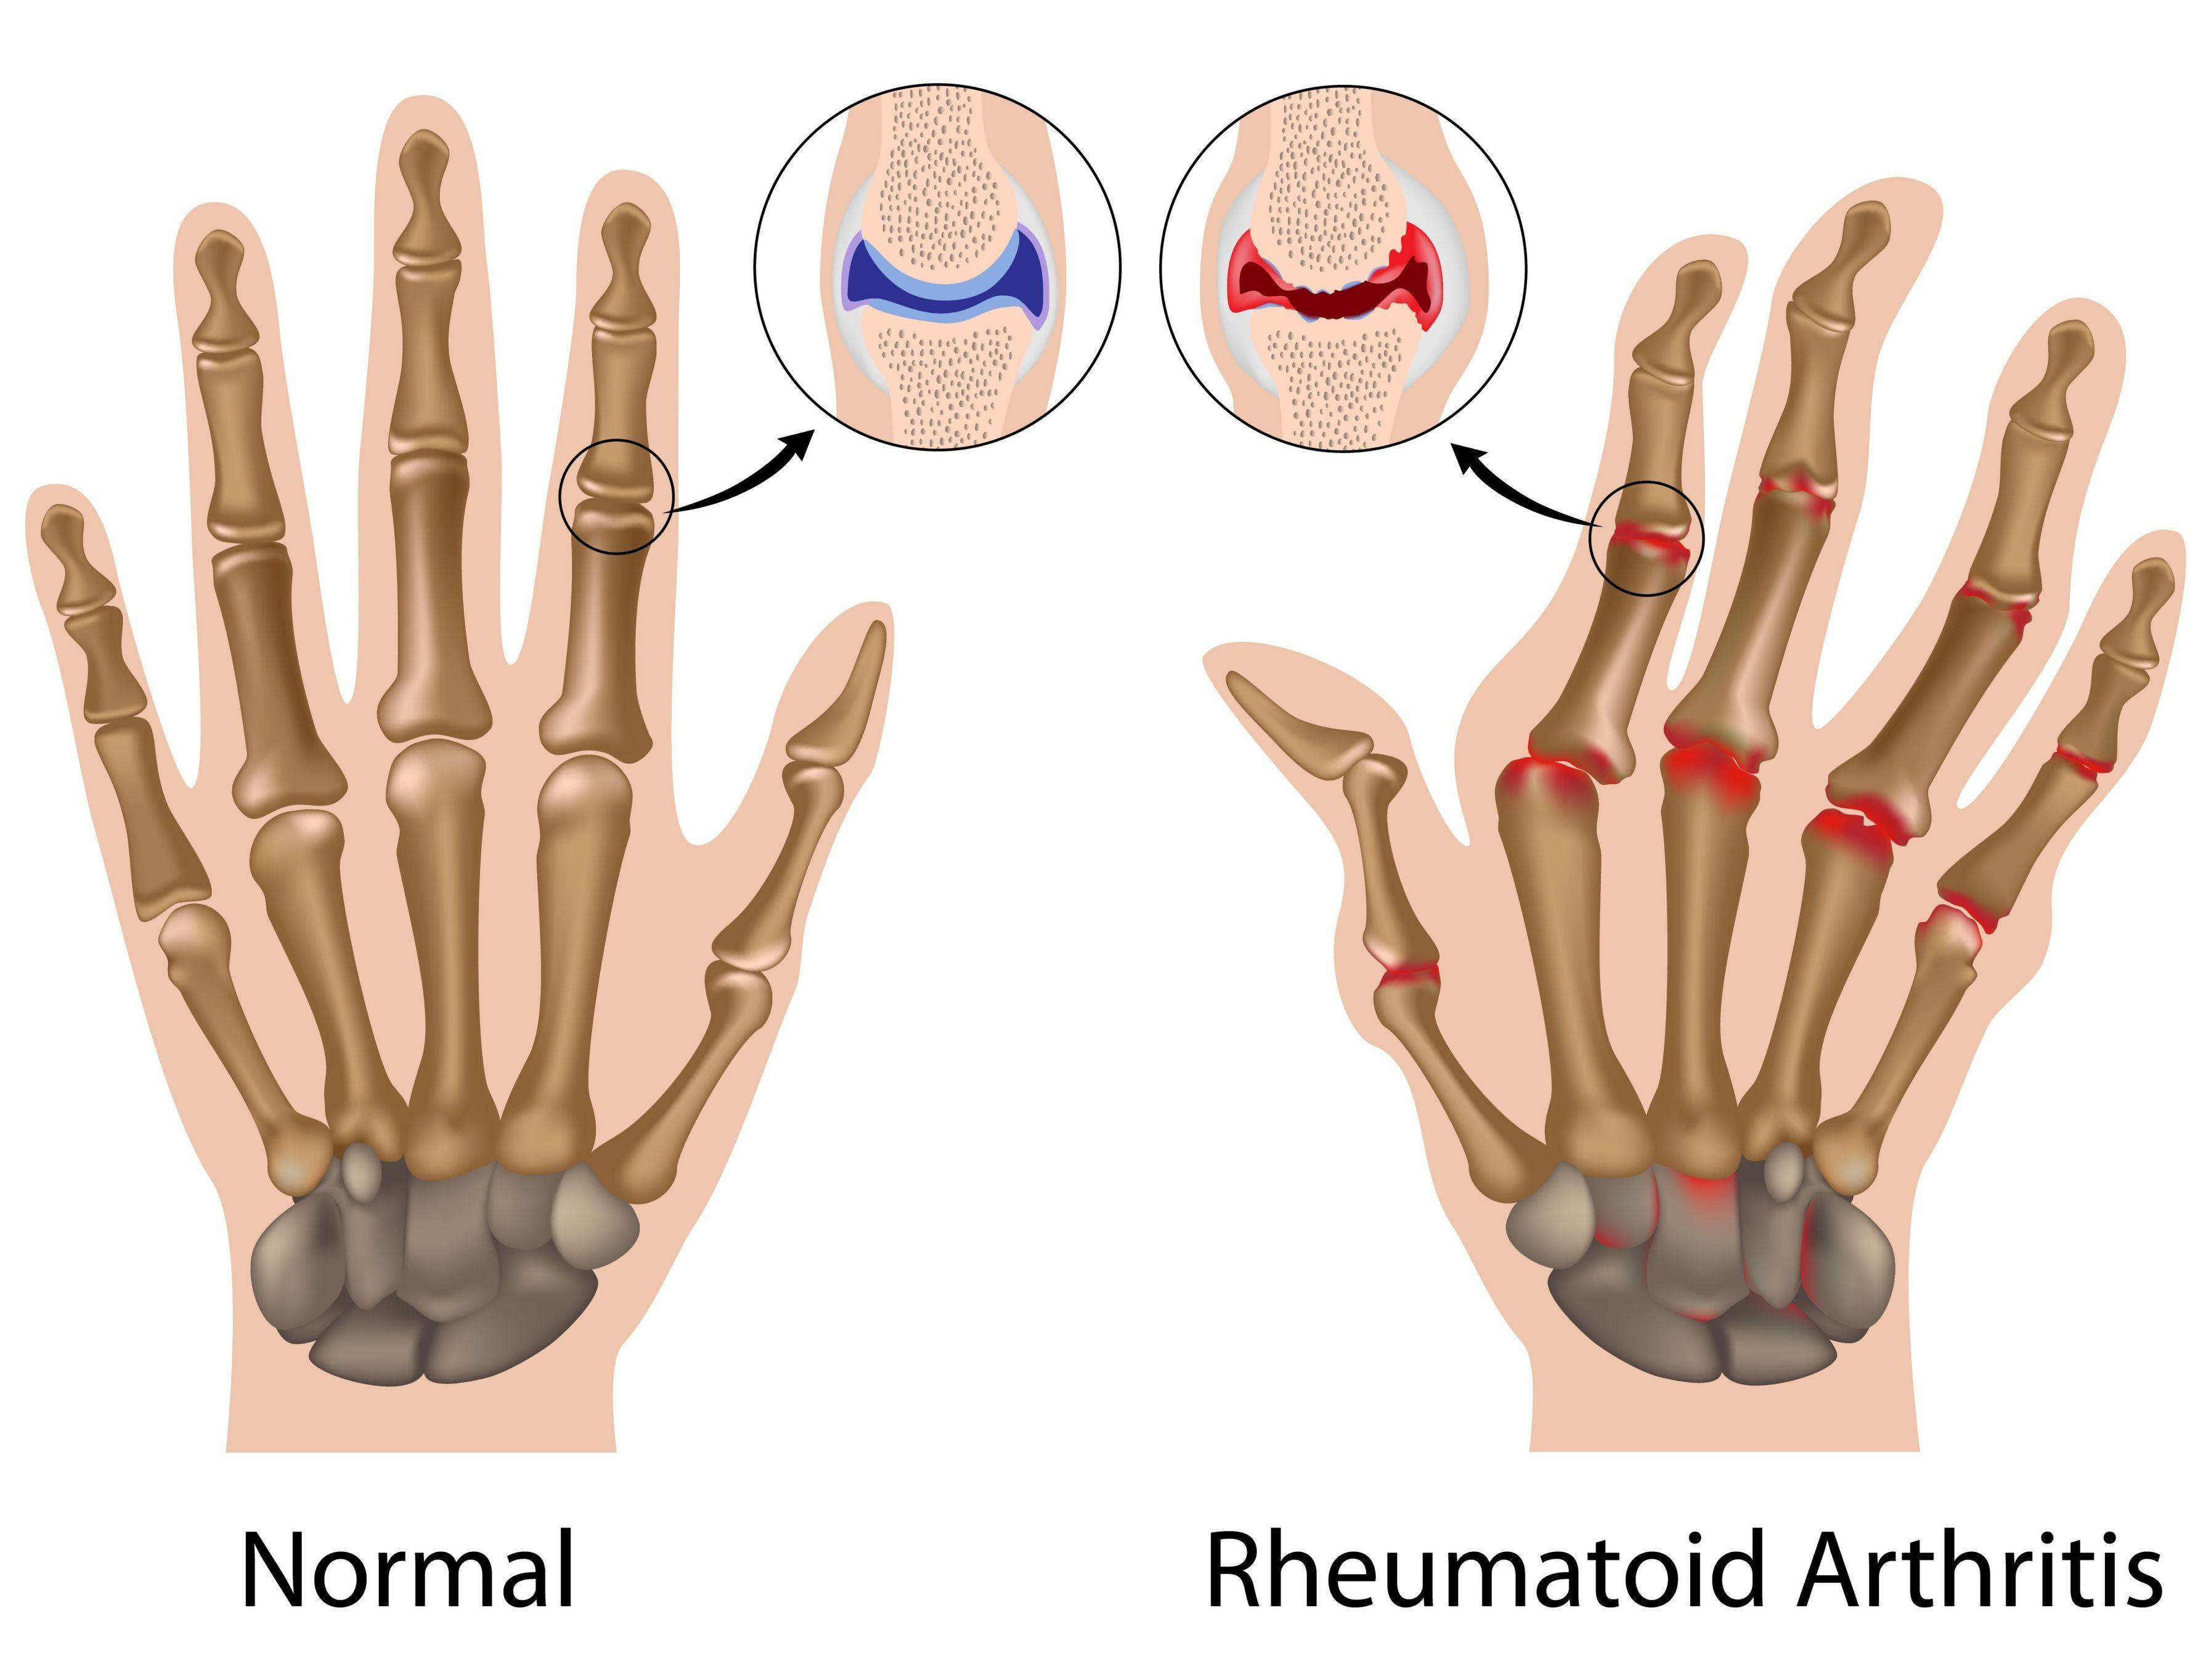 артроз артрит разница